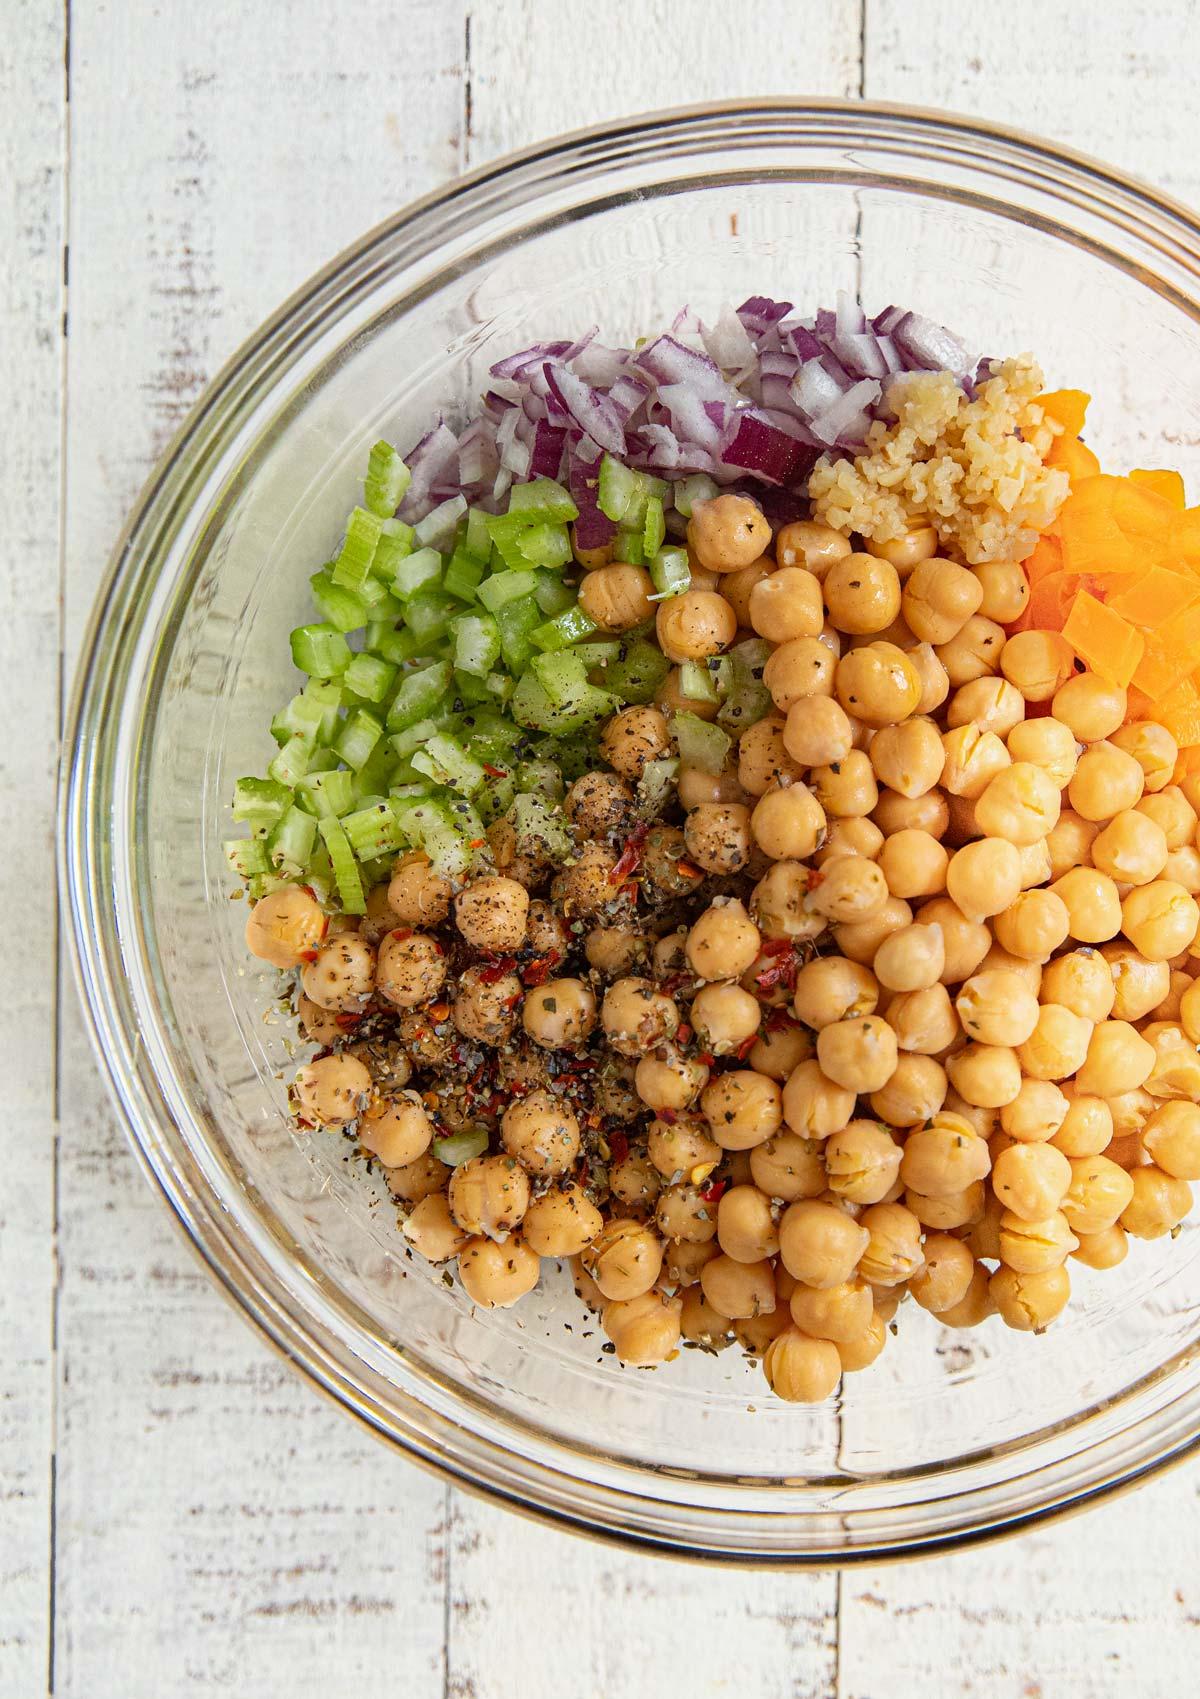 Chickpea Salad Ingredients